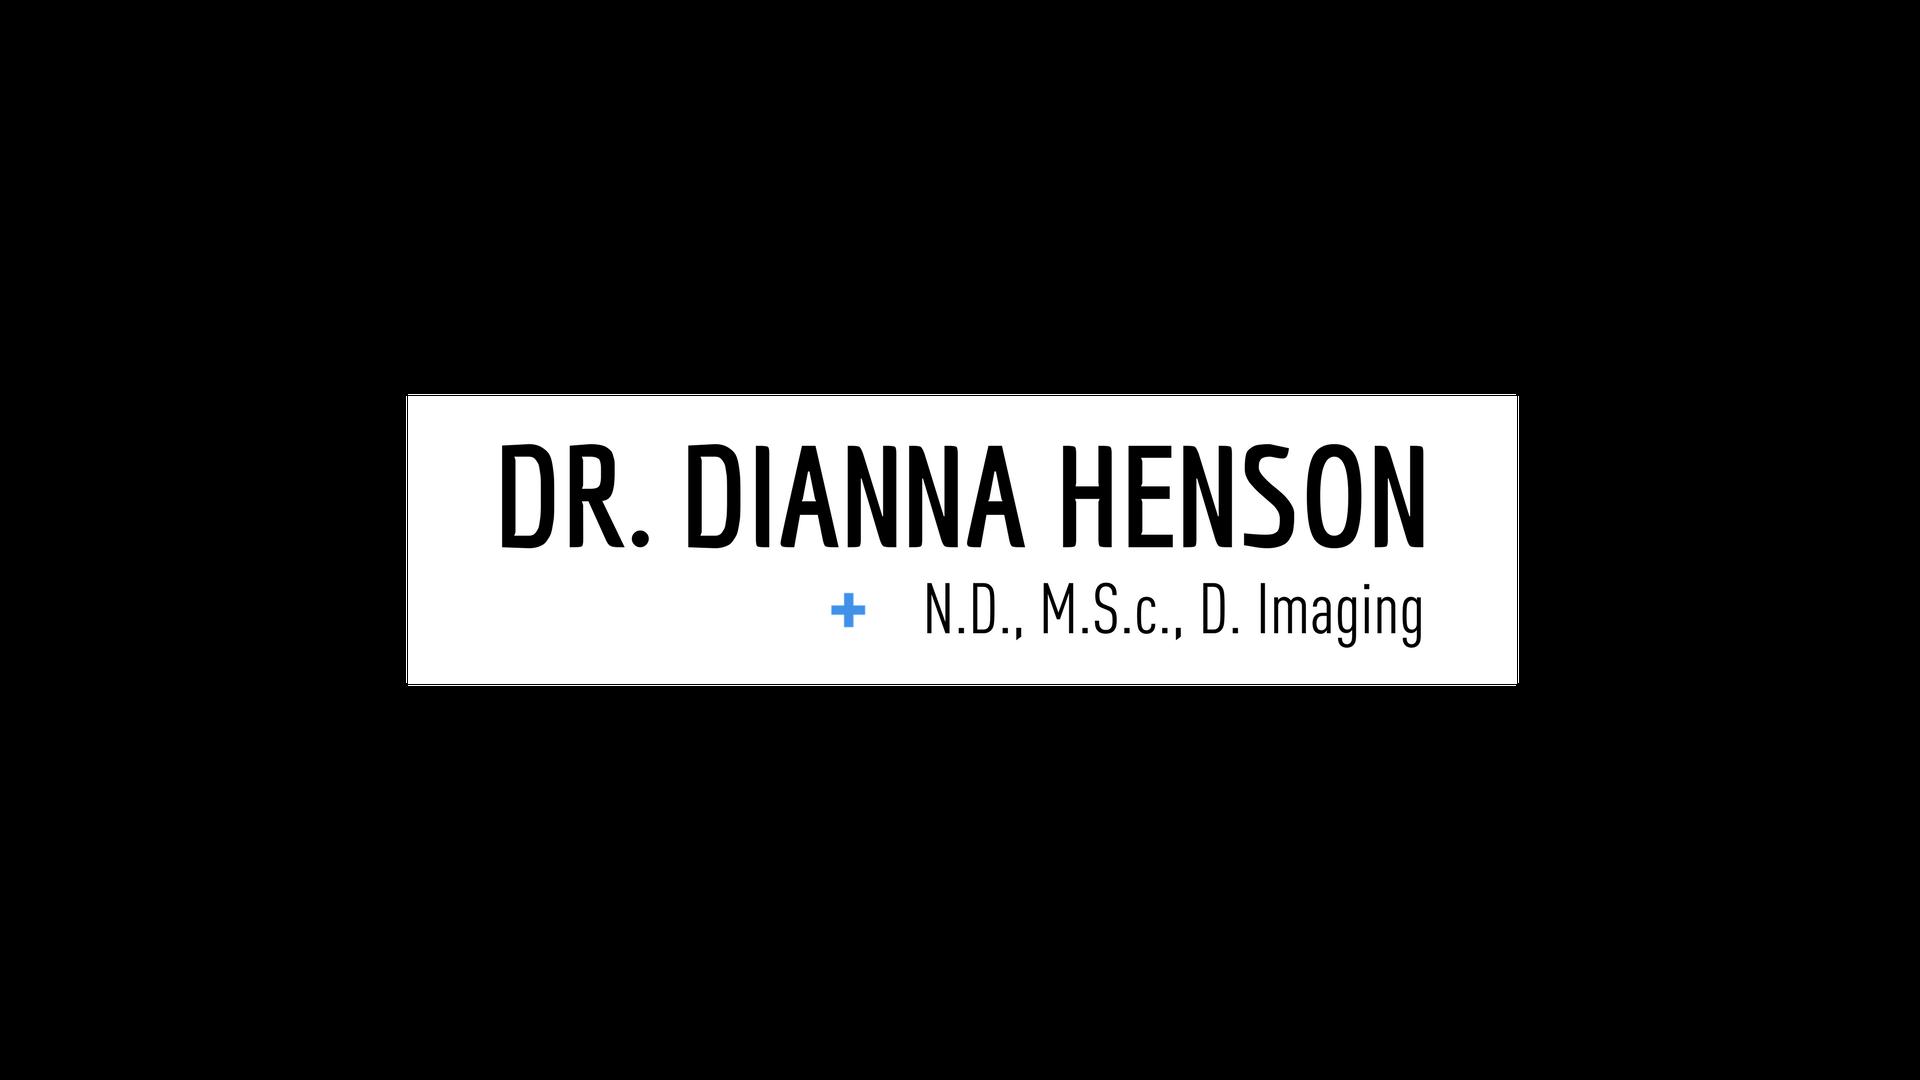 Copy of DR. DIANNA HENSON,N.N., (5).png